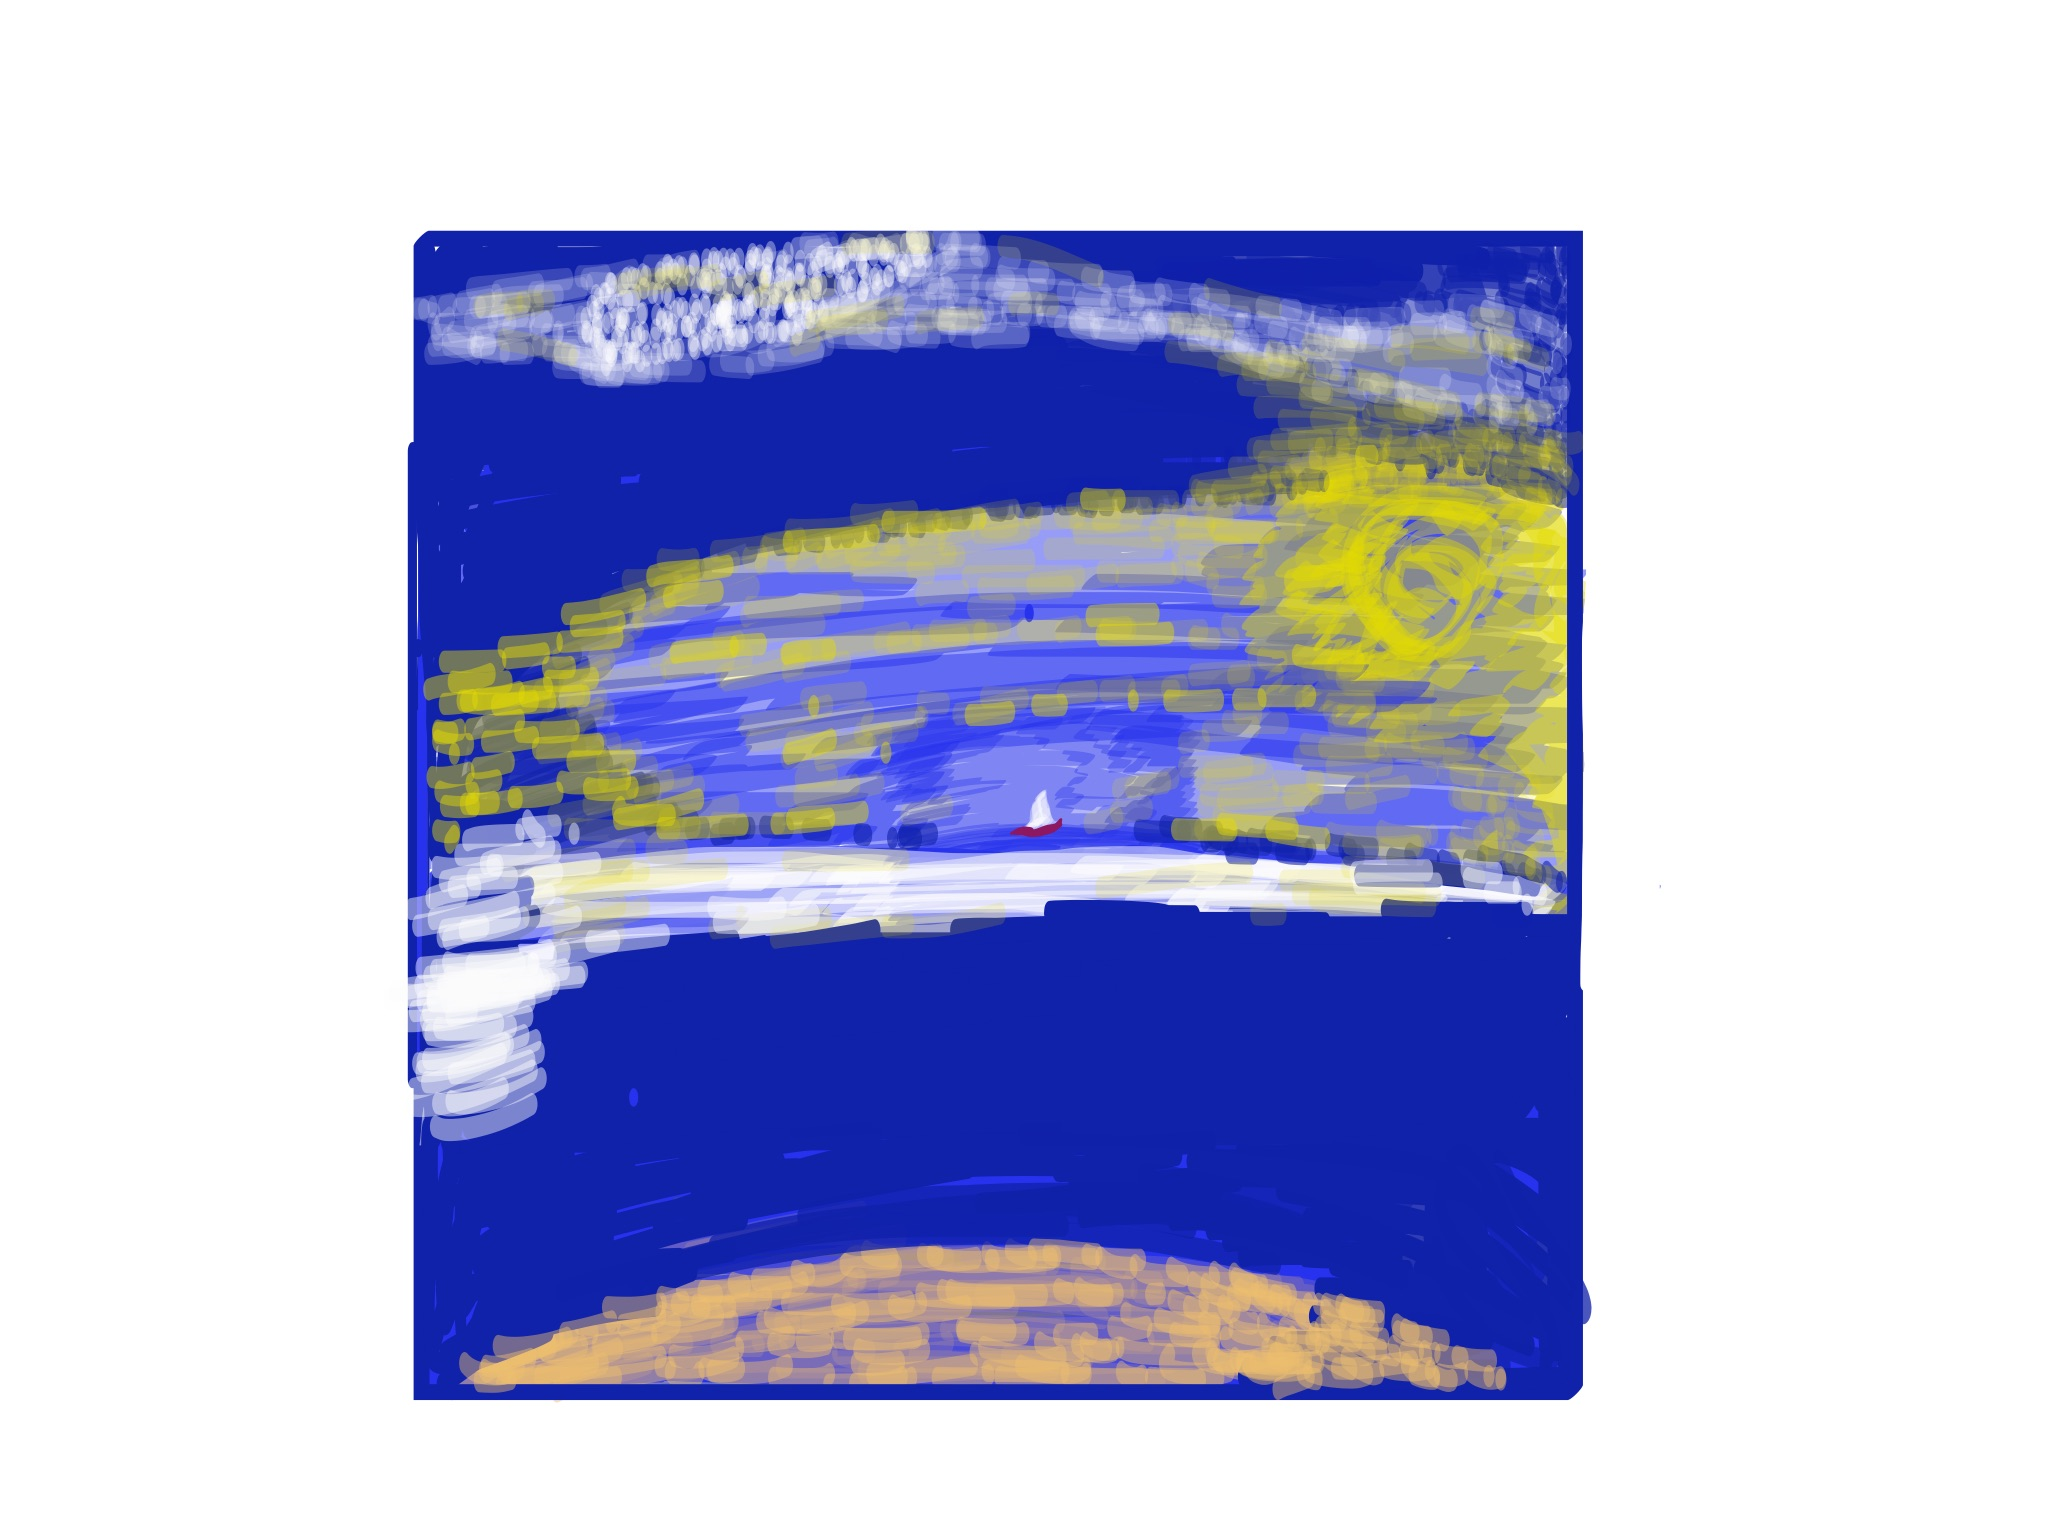 Image-1 (13).jpg